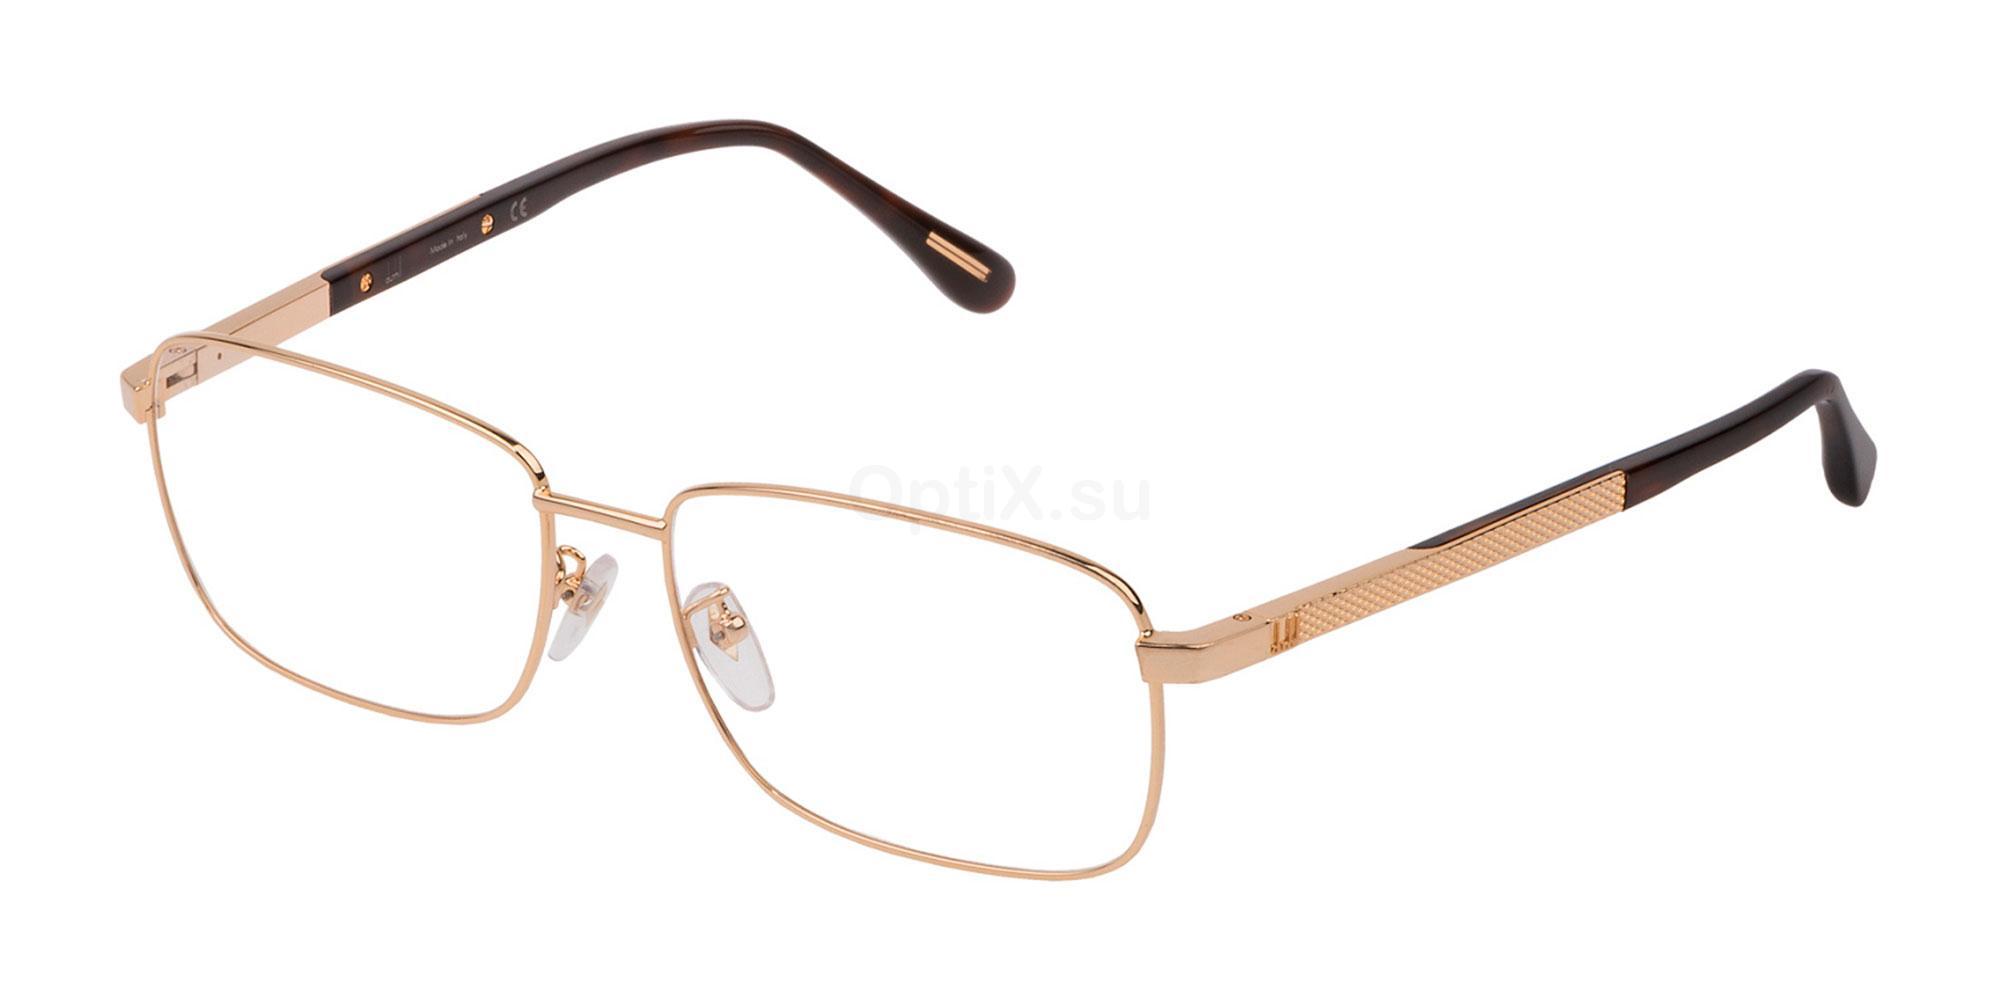 0300 VDH147G Glasses, Dunhill London